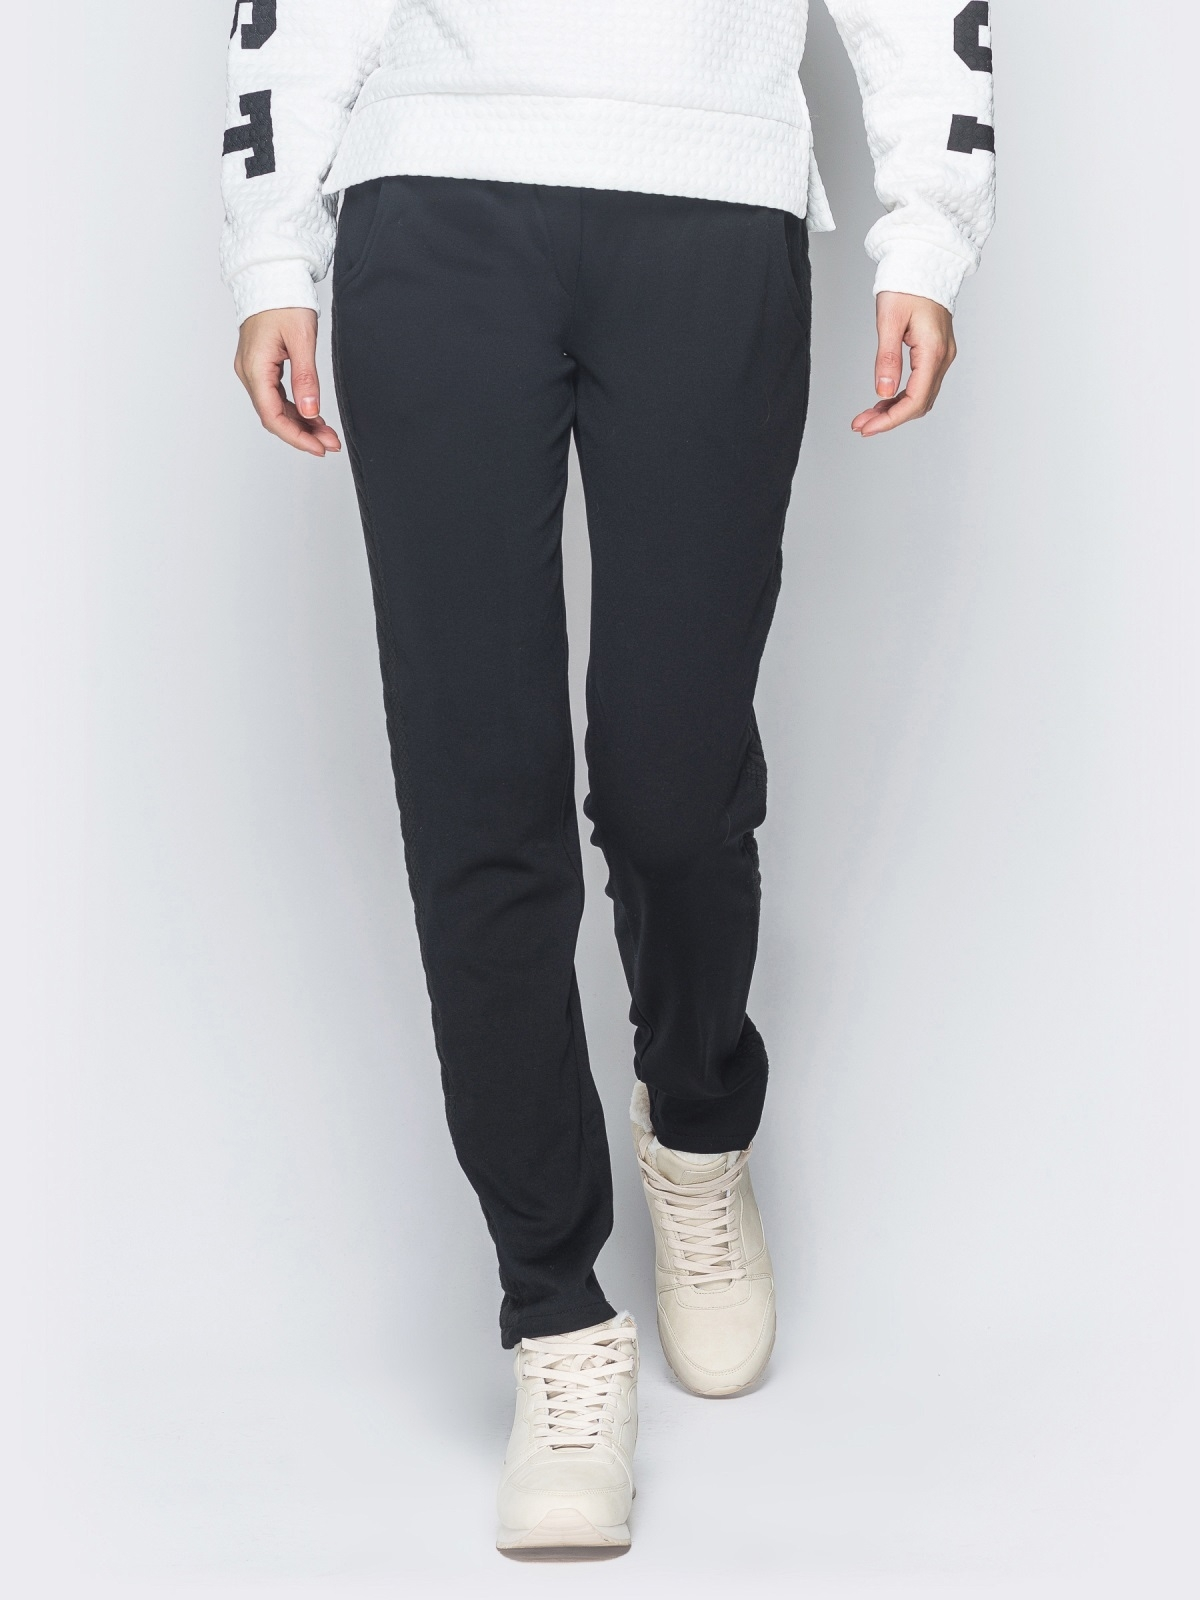 Брюки чёрного цвета с карманами по бокам 42970, фото 1